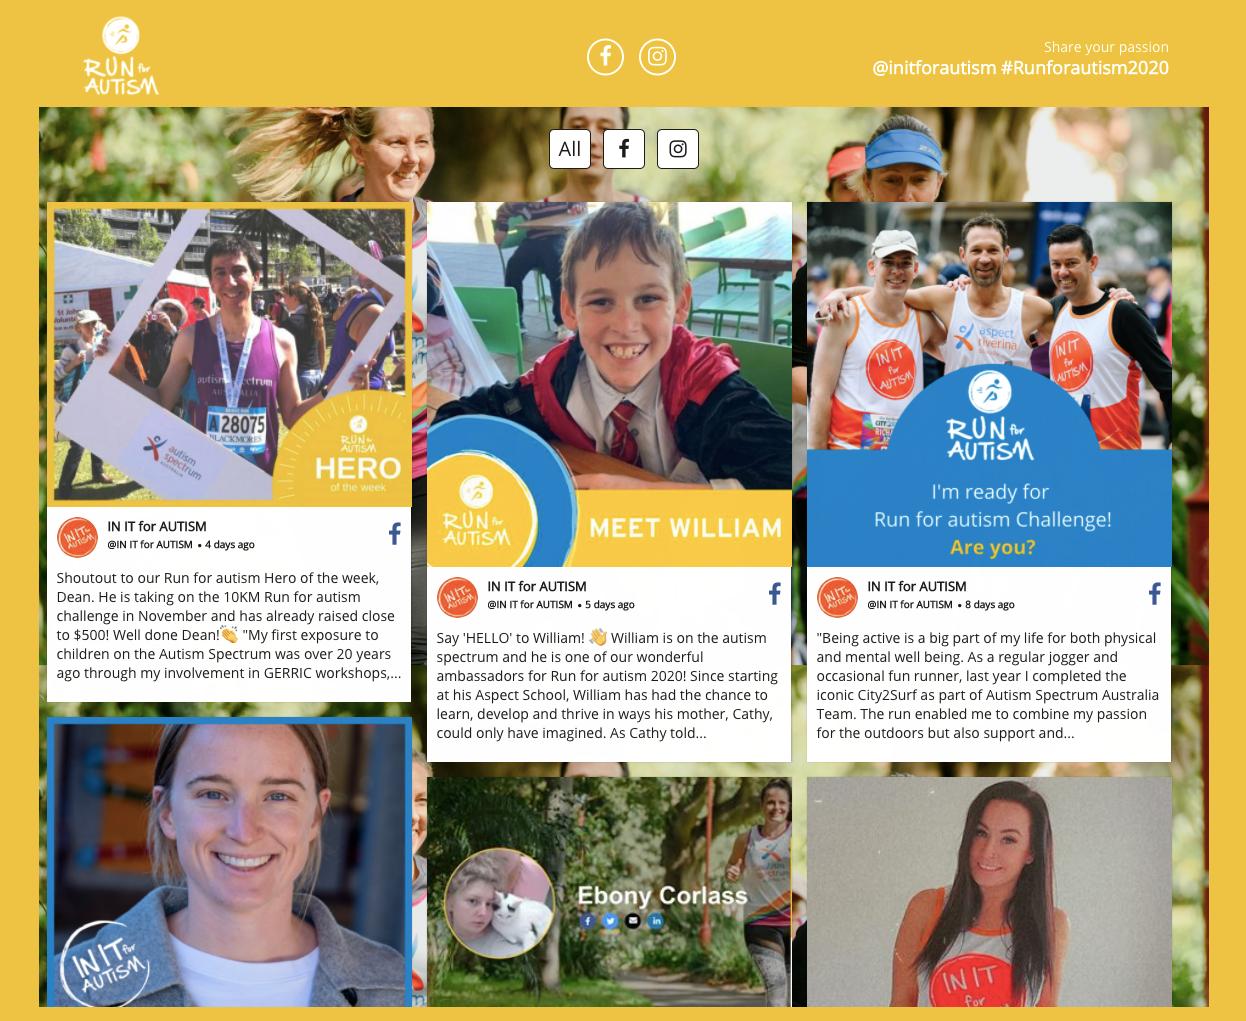 hashtag campaign for nonprofits